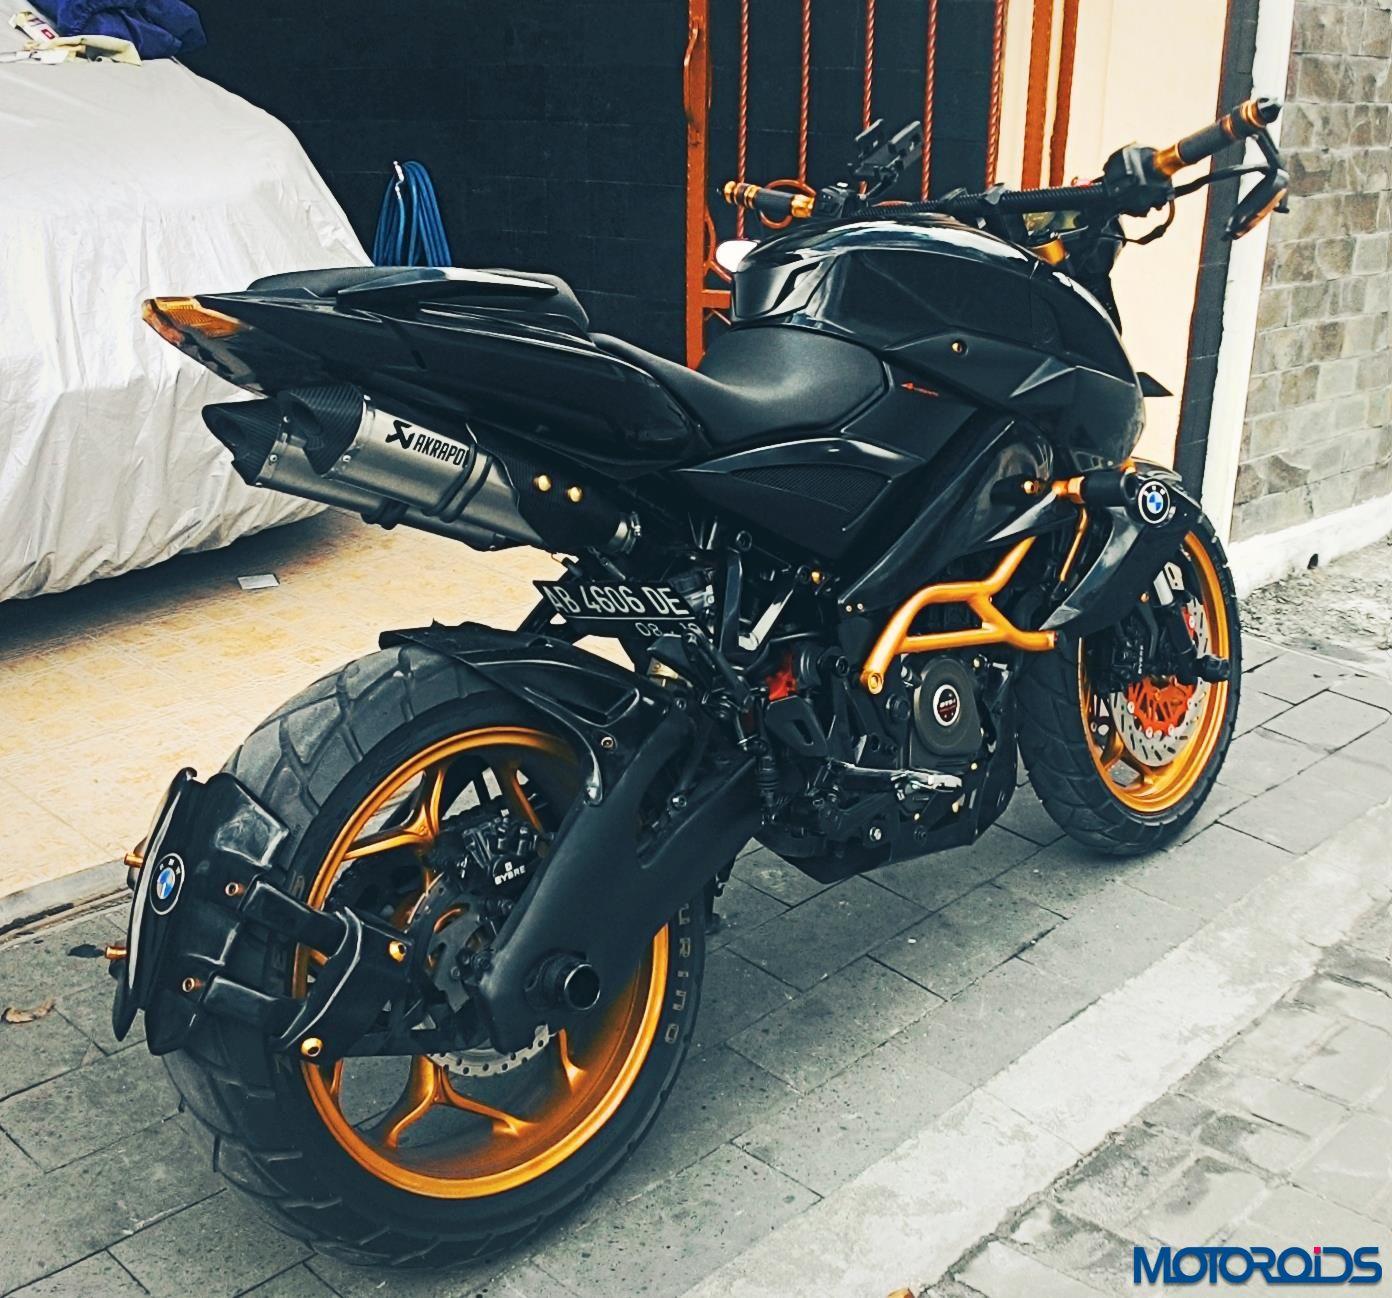 Kerala High court bans modification of bikes | Motoroids